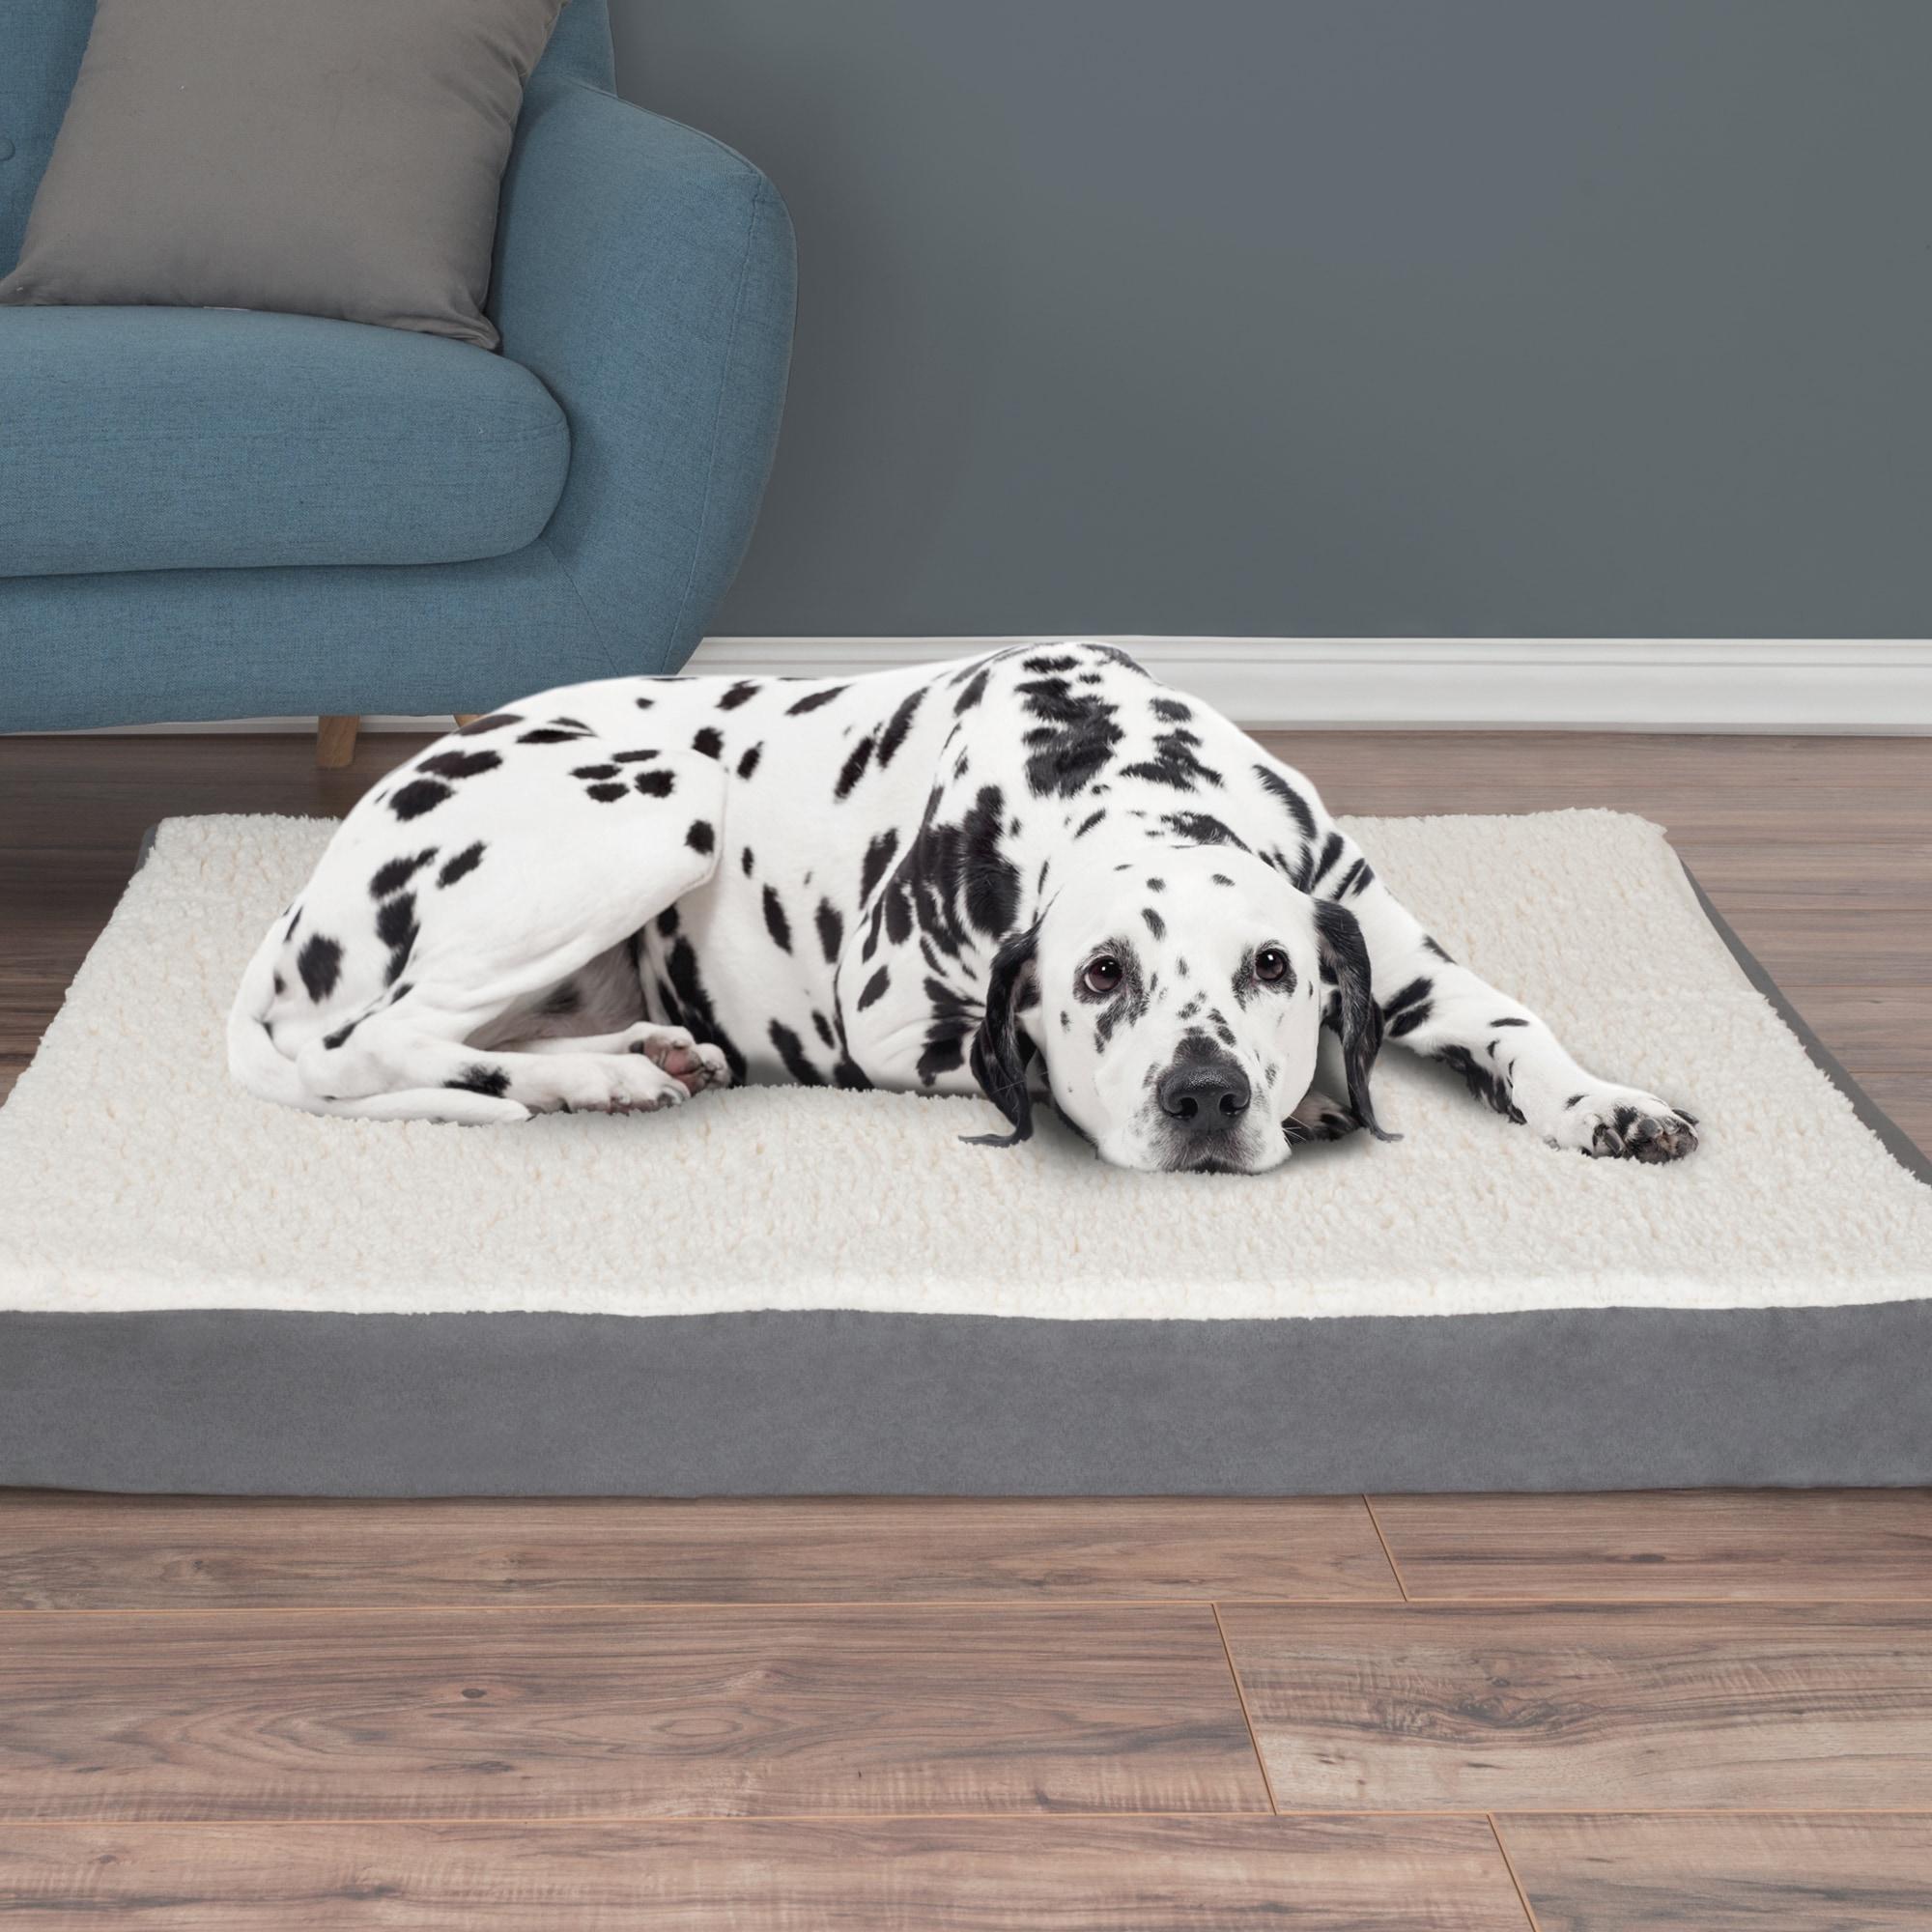 Petmaker Orthopedic Sherpa Top Pet Bed (36x27x4 Tan), Siz...